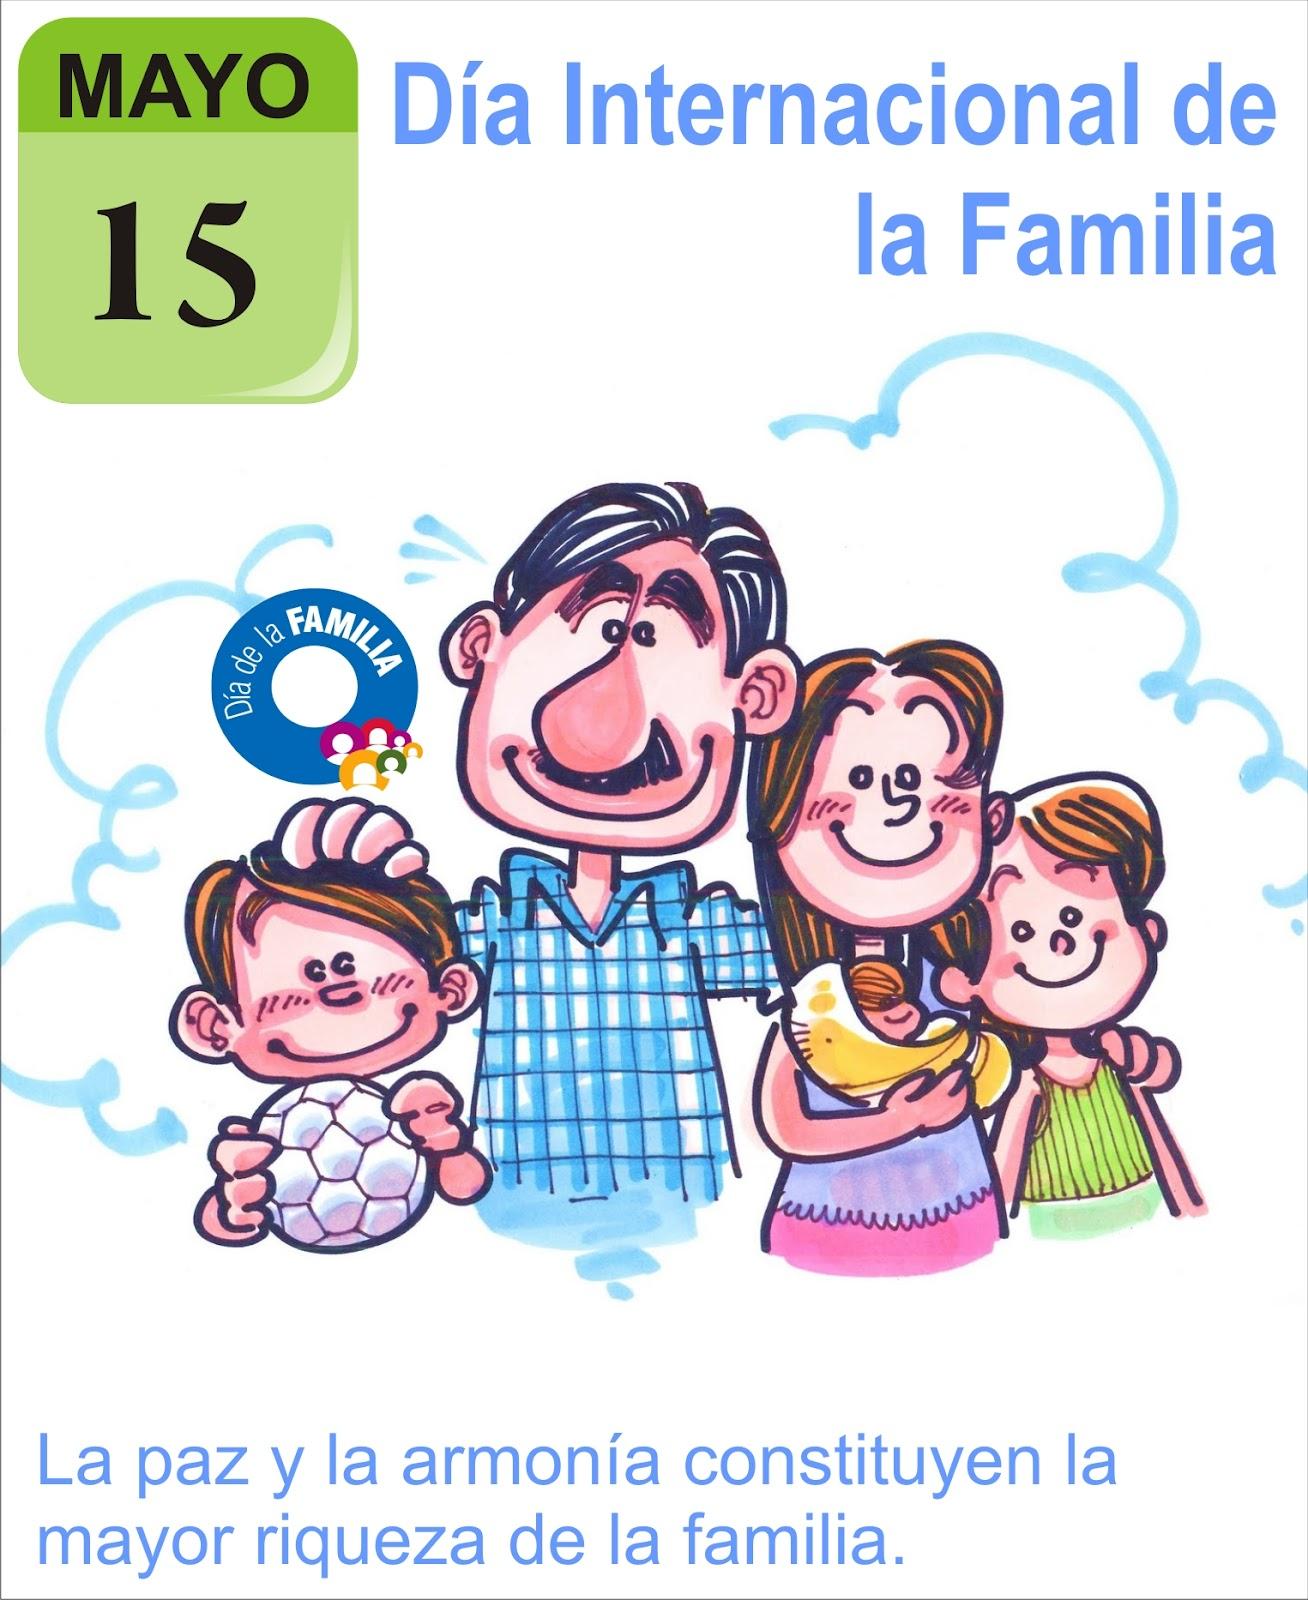 Im genes del d a internacional de la familia para for Noticias dela farandula internacional 2016